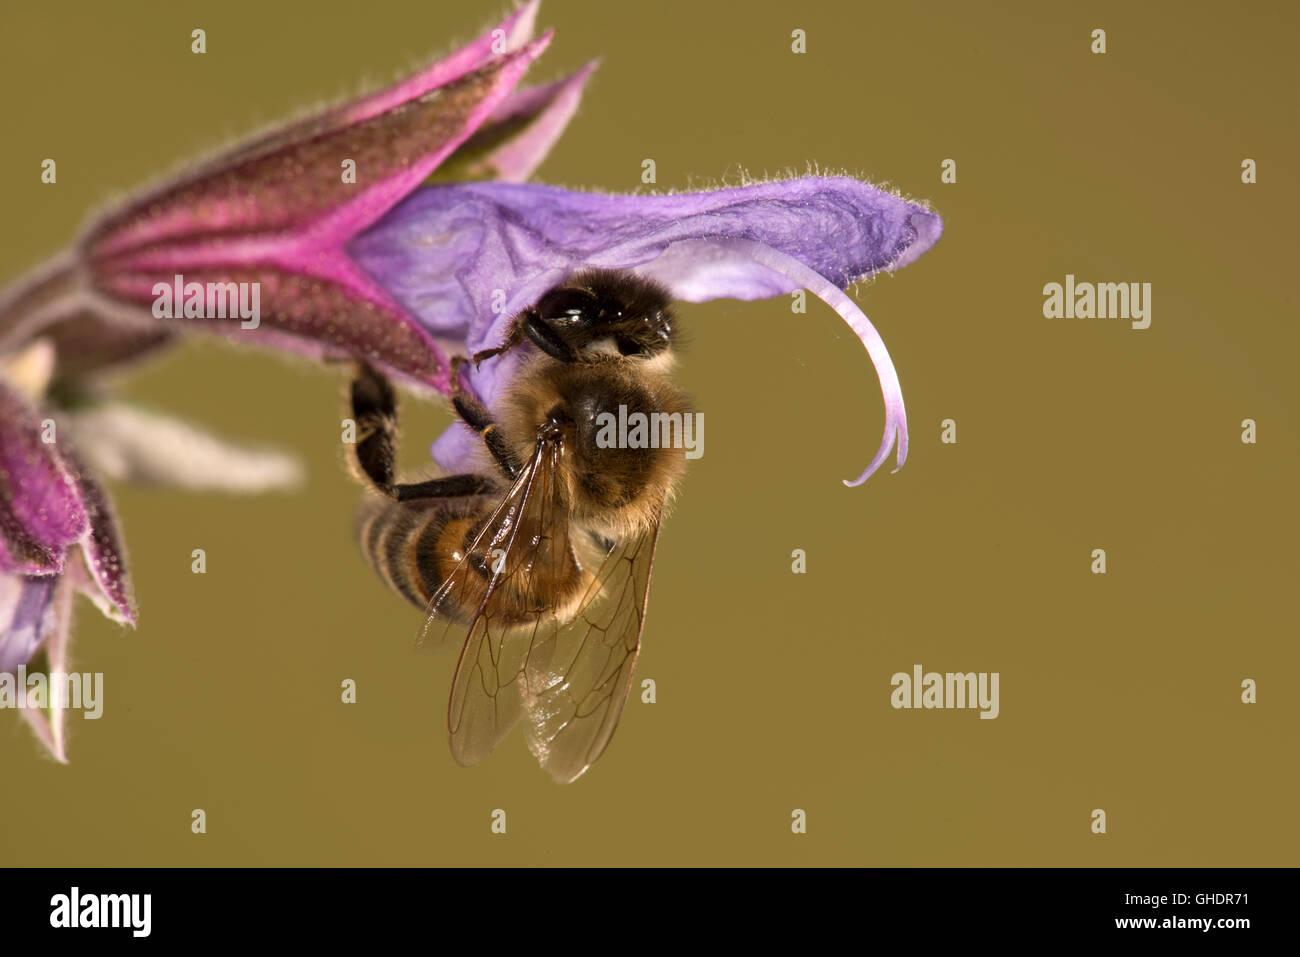 Honey Bee Apis mellifera - Stock Image